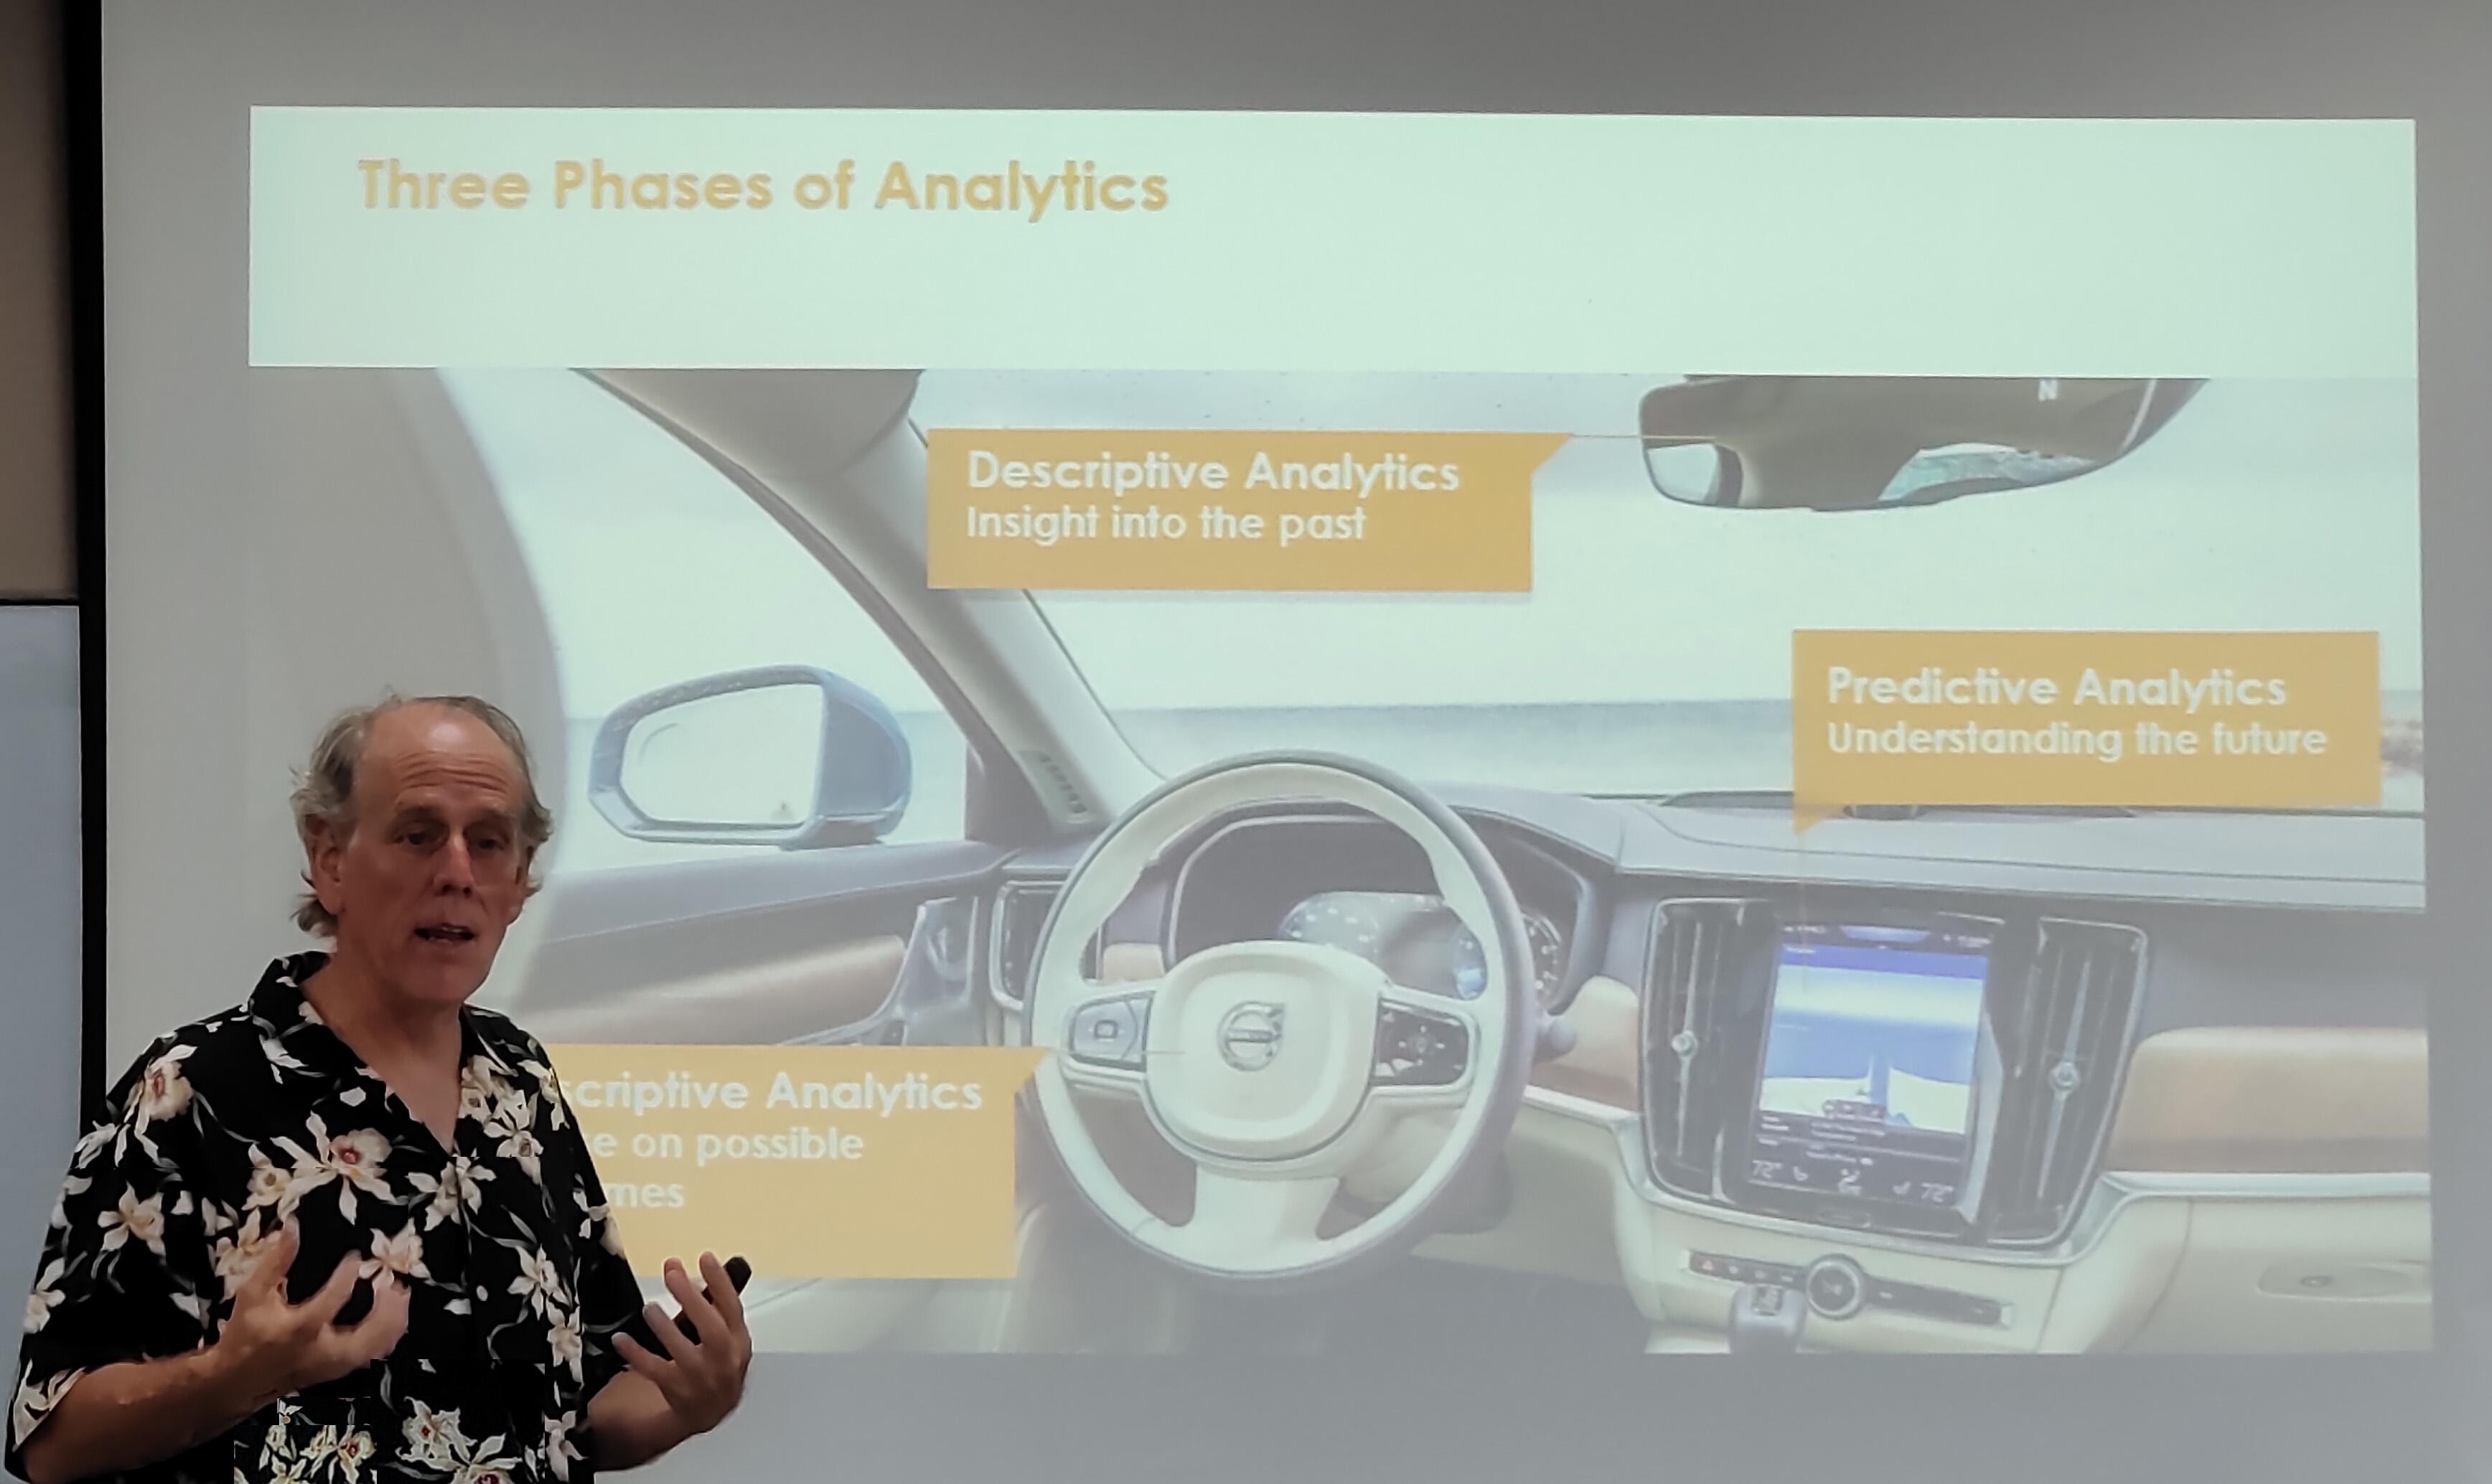 Teradata CTO宝立明:高级分析将成主流 未来属于机器学习时代